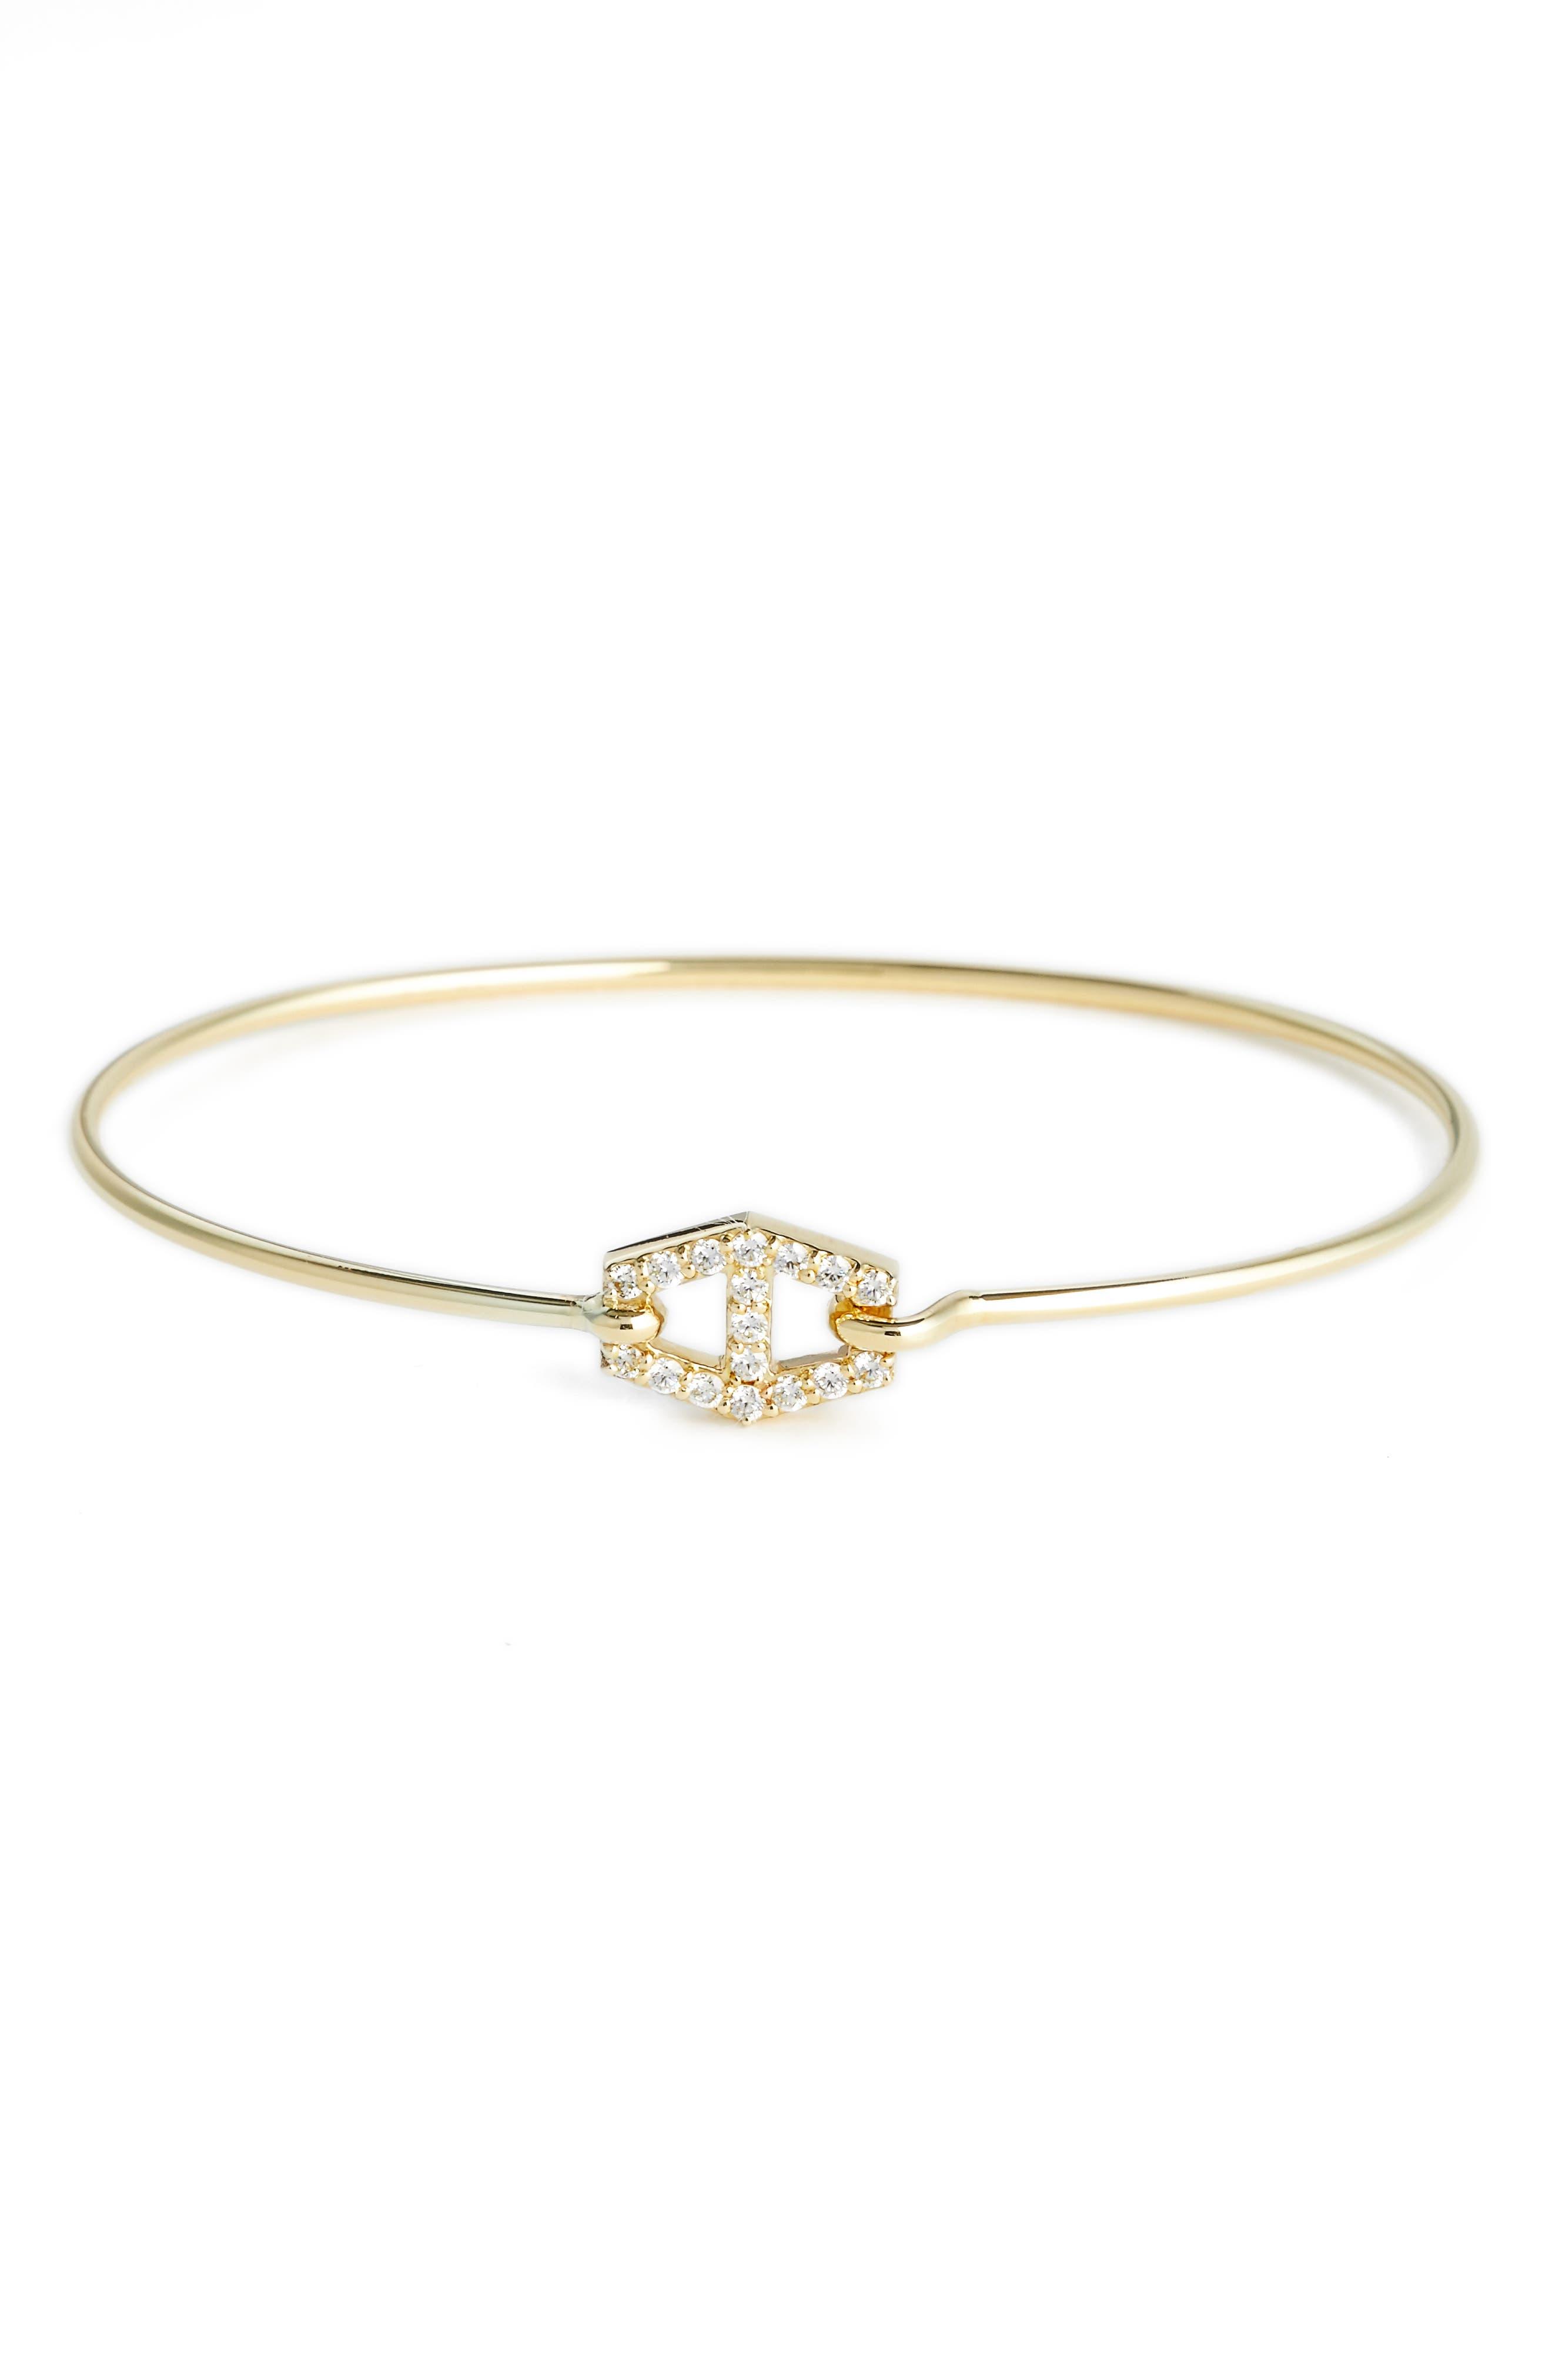 Jemma Wynne Prive Diamond Bangle